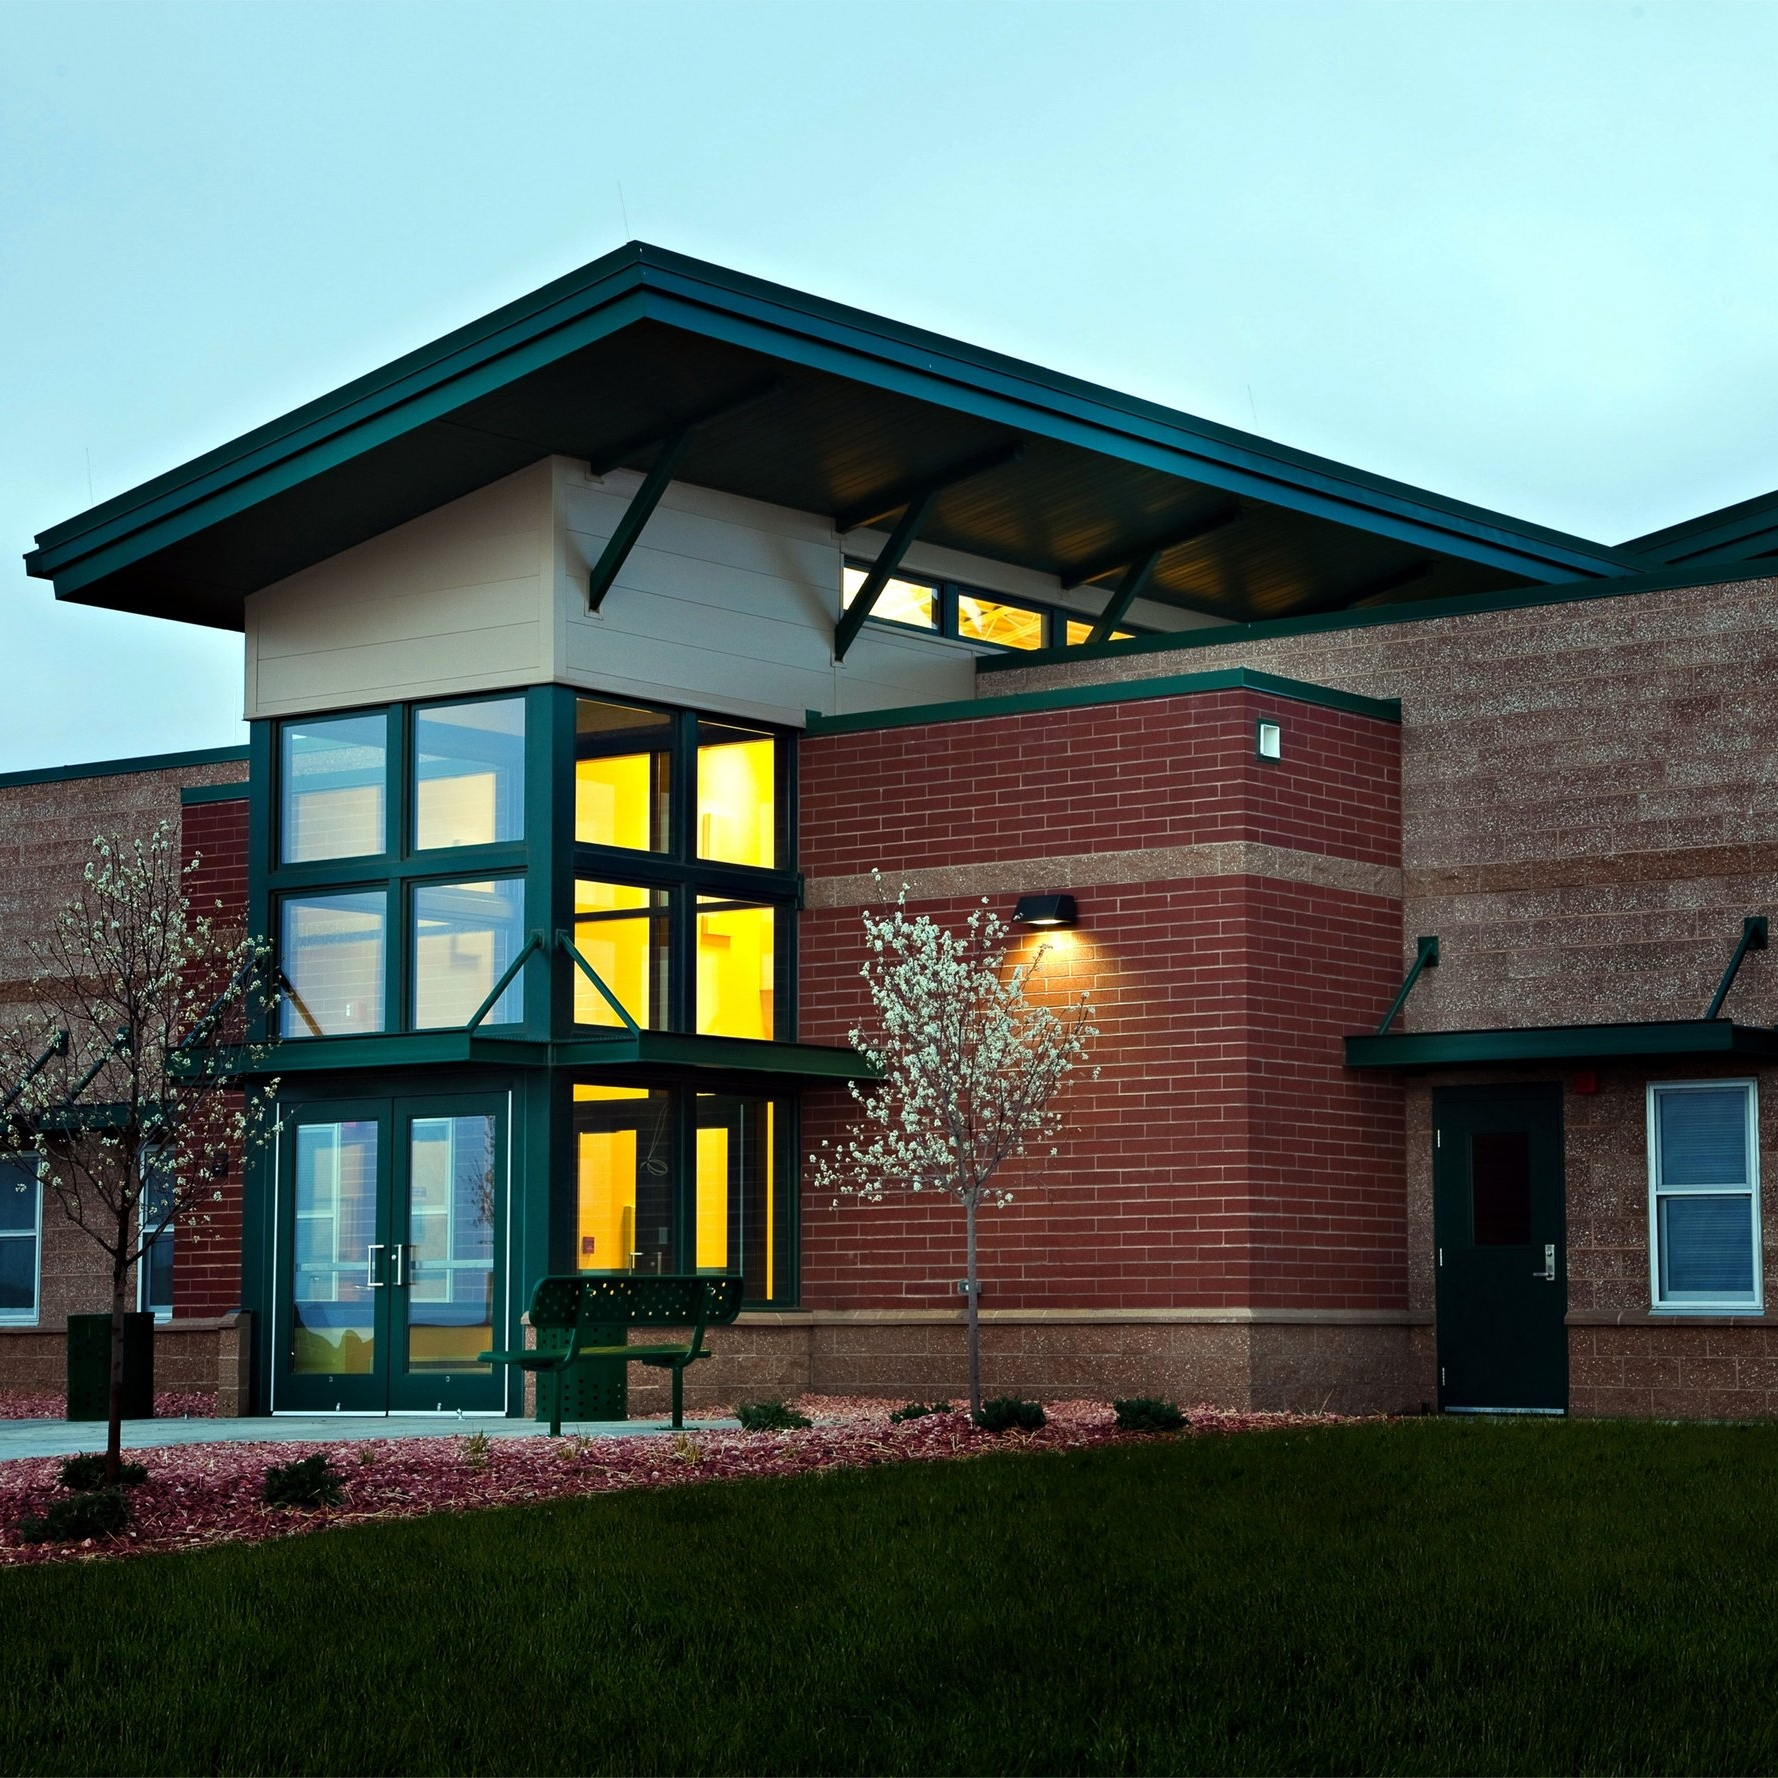 FORT CARSON CHILD DEVELOPMENT CENTER - Fort Carson, CO